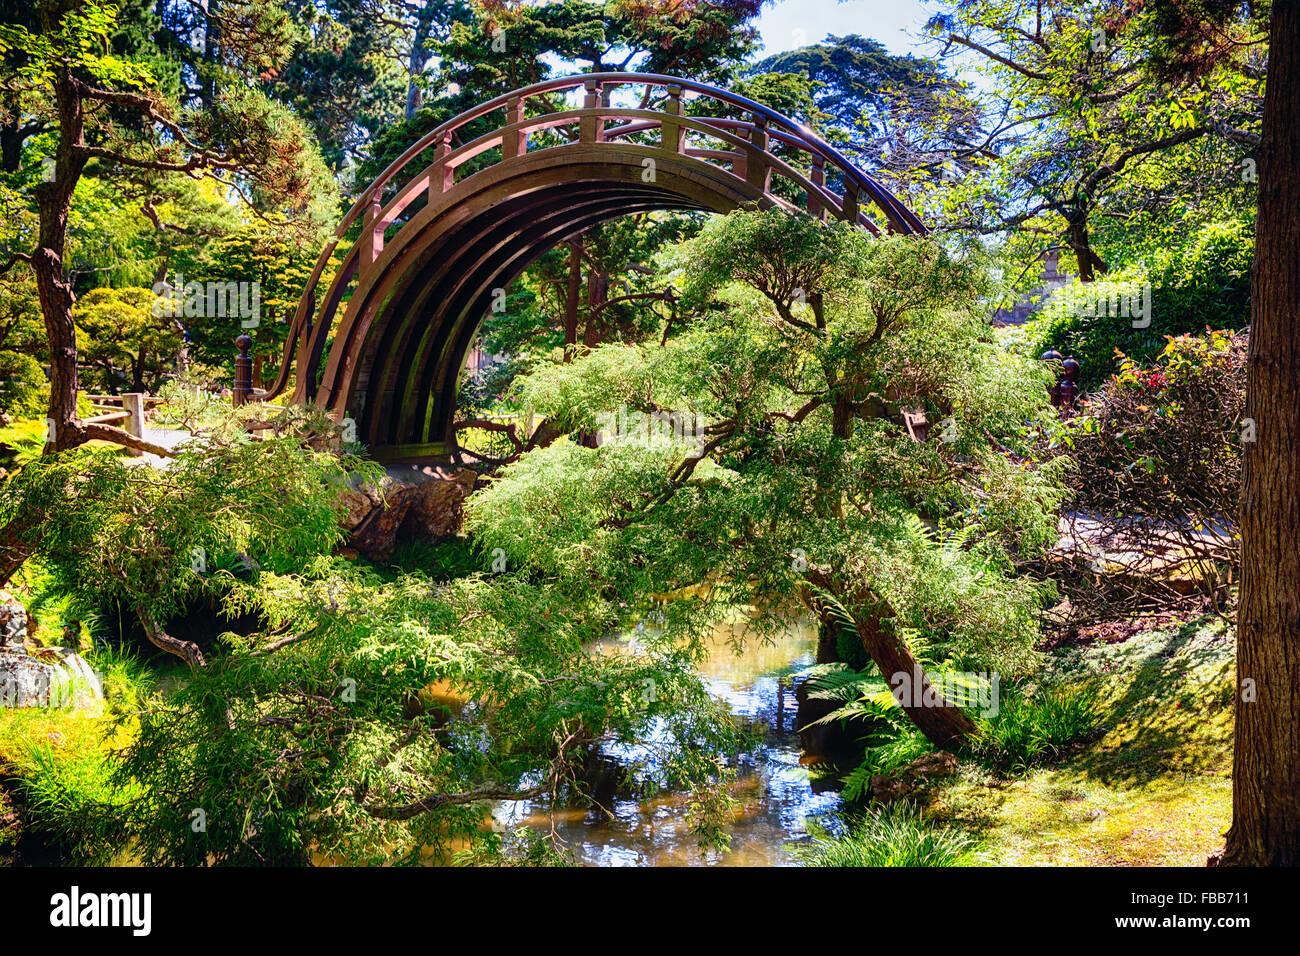 Low Angle View of a Moon Bridge Over a Small Creek in a Japanese Garden, Golden Gate Park, San Francisco, California - Stock Image